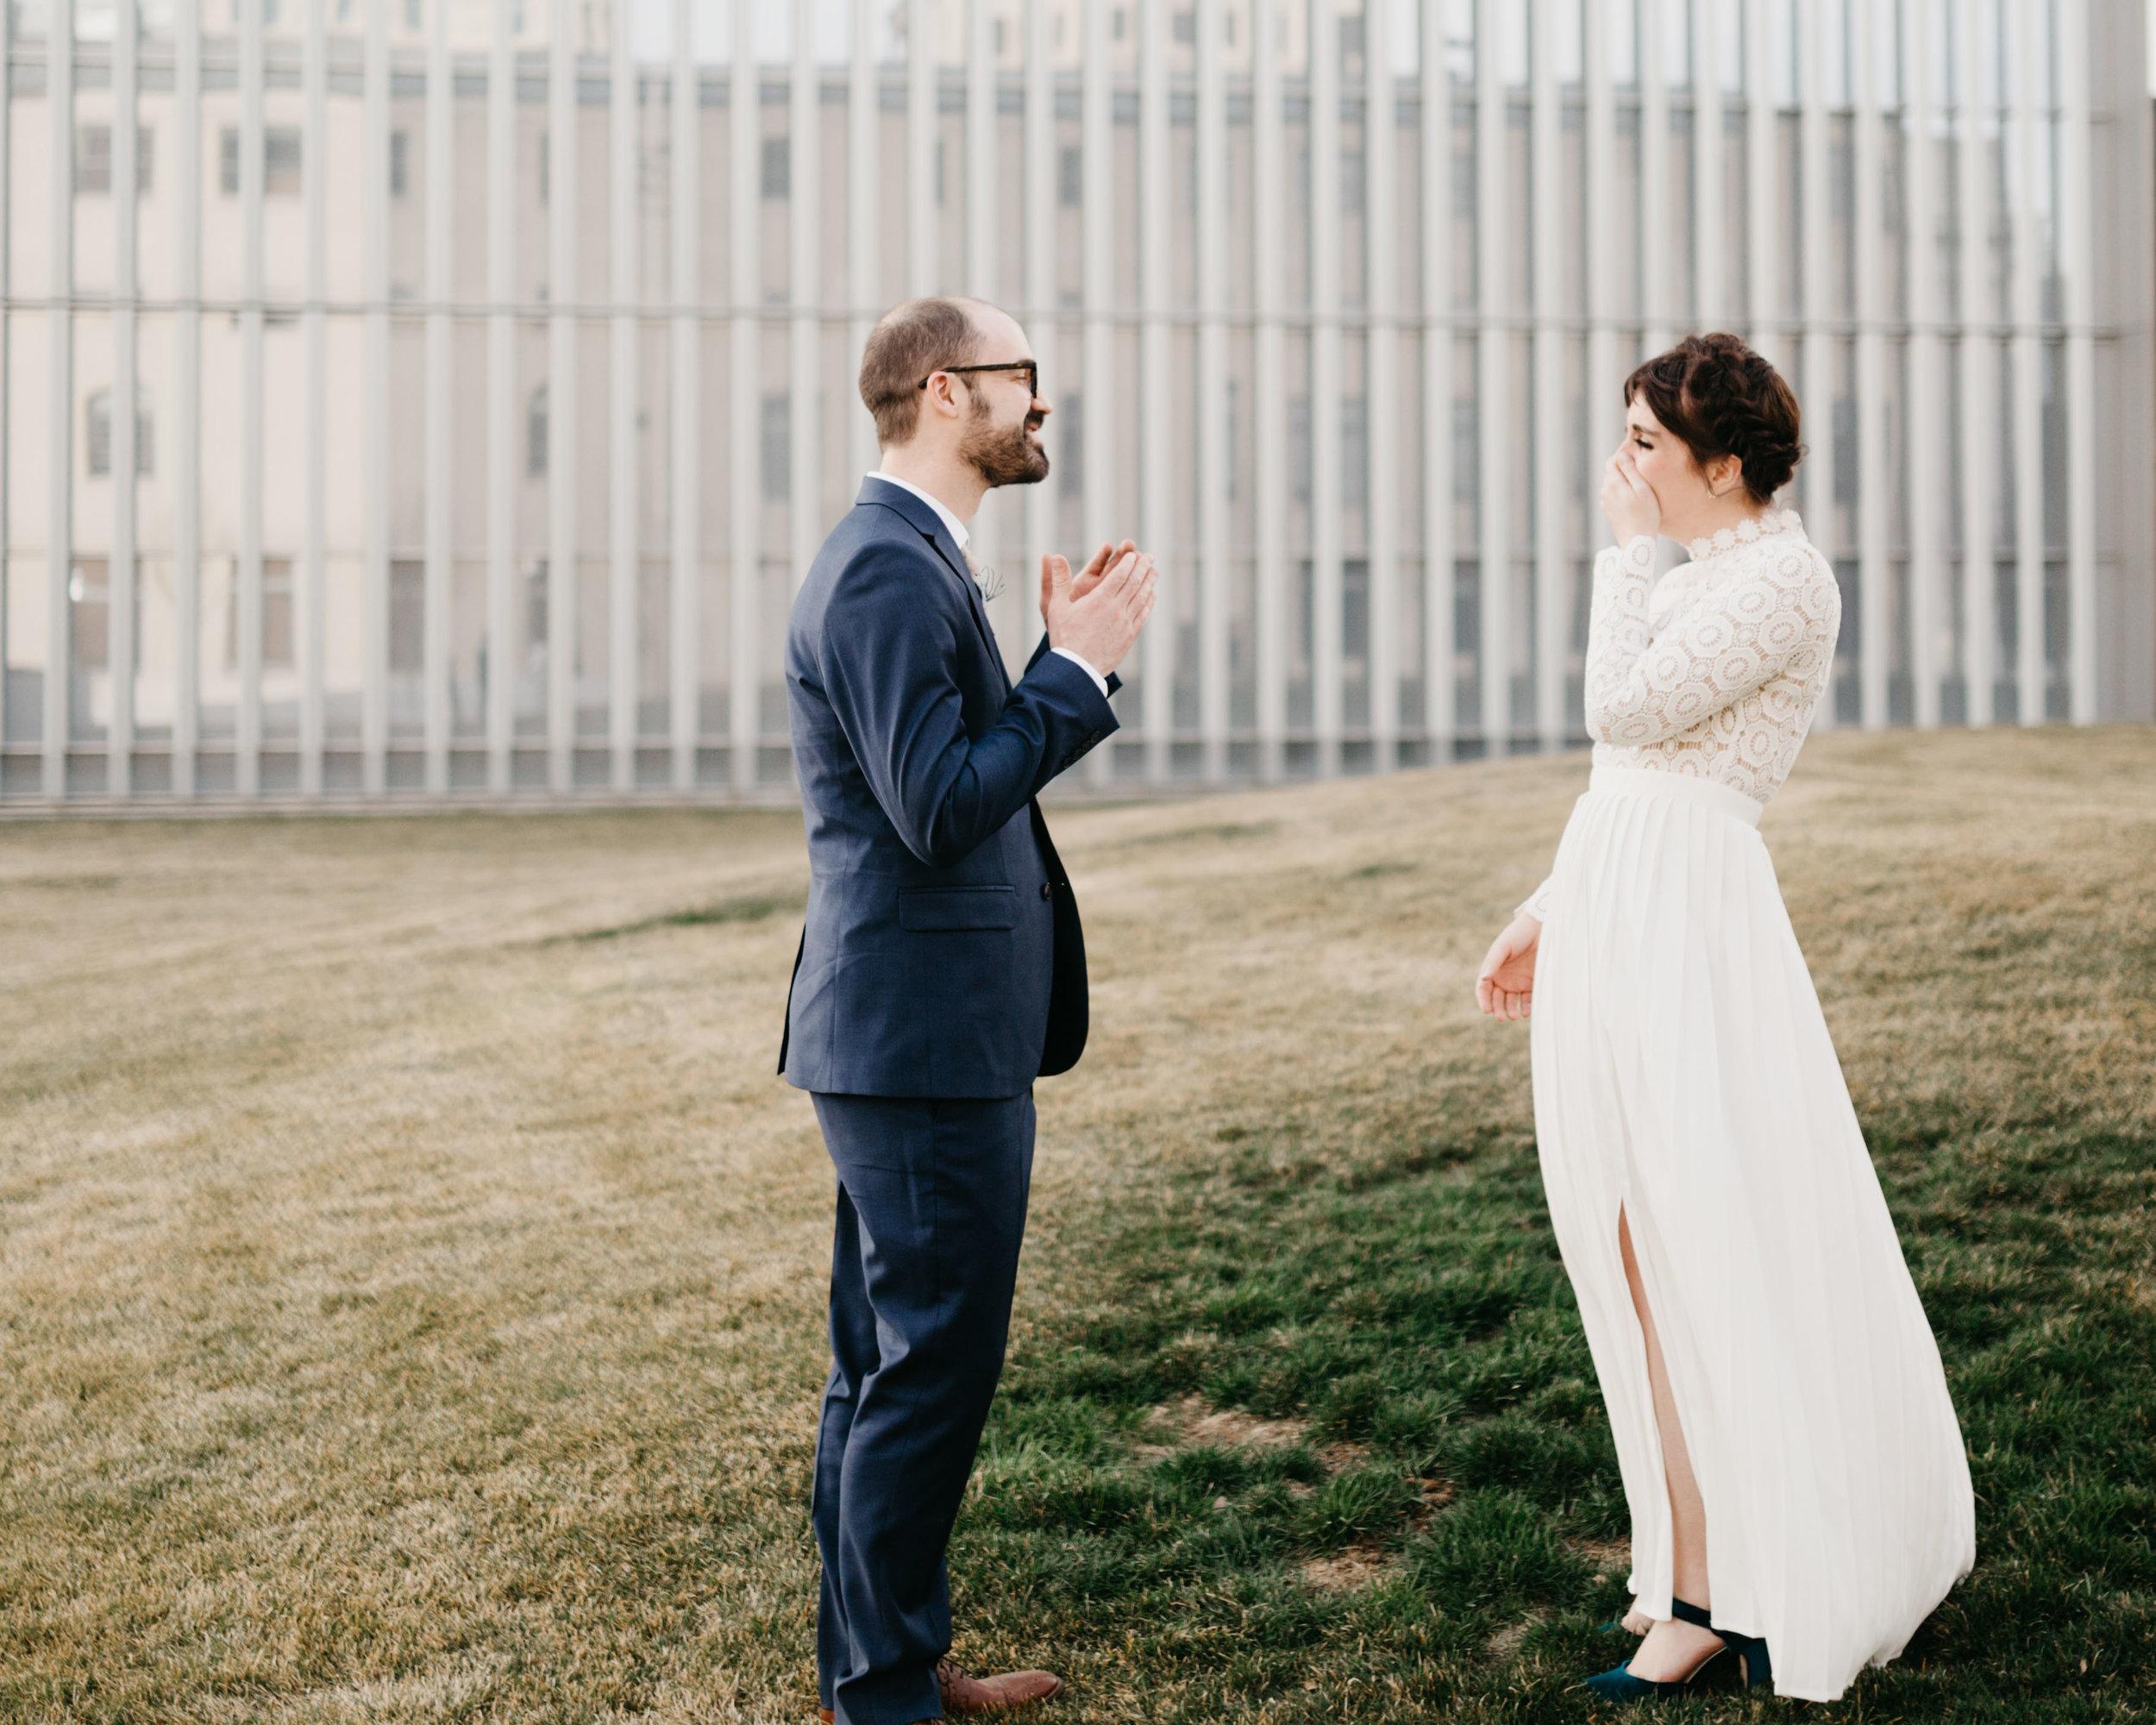 Utah-Wedding-Utah-Photographer-4.jpg